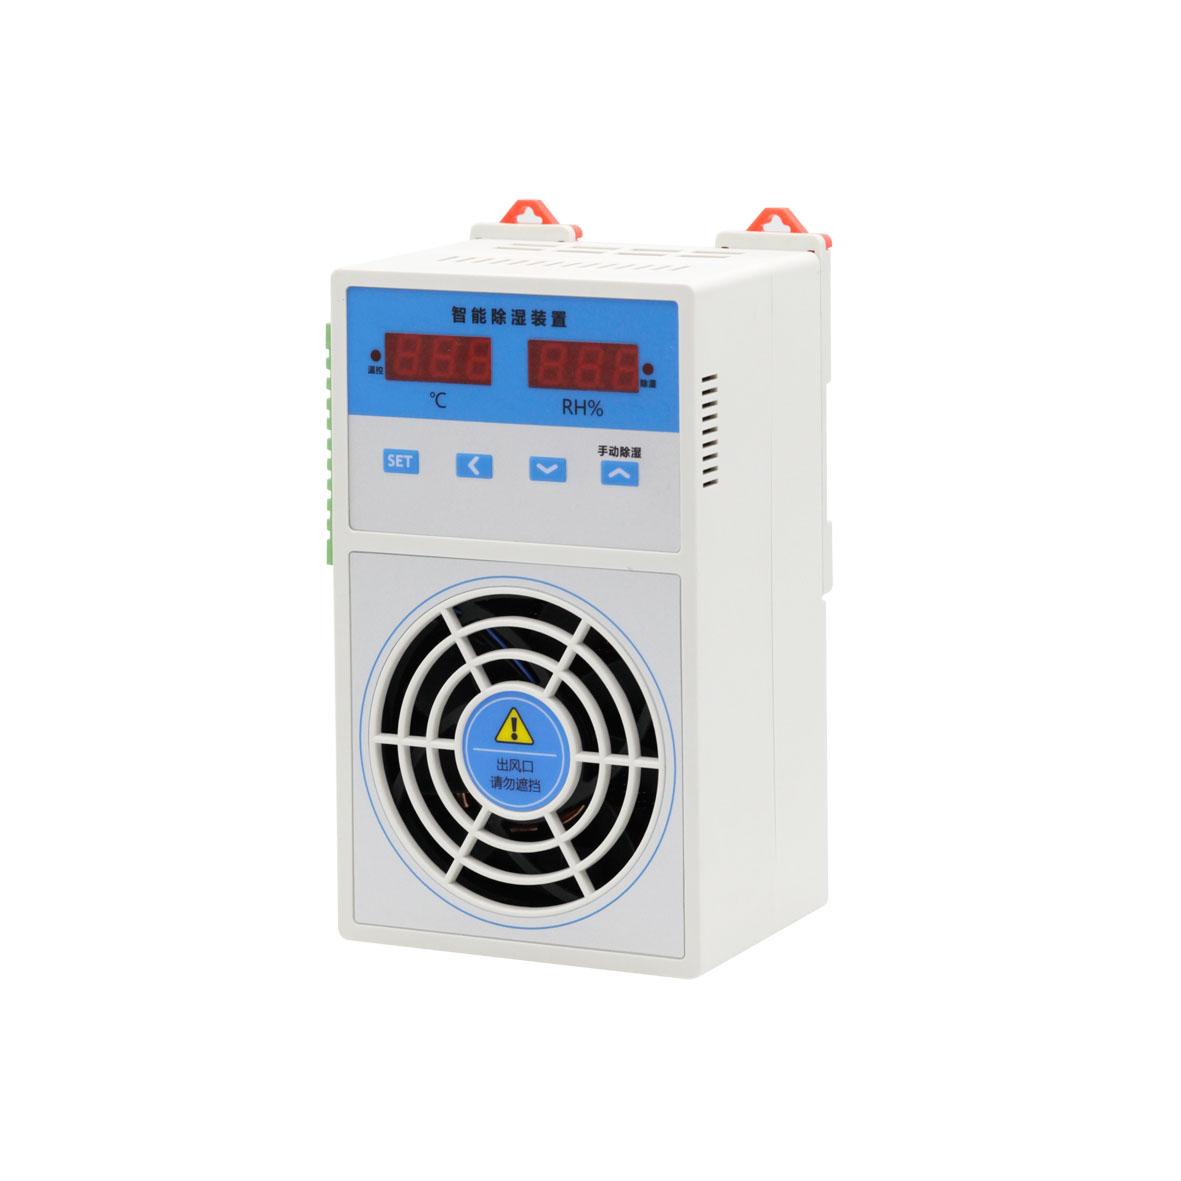 WWW_KKAV7676_COM_新闻开远gb-8030tw配电房除湿装置市场报价